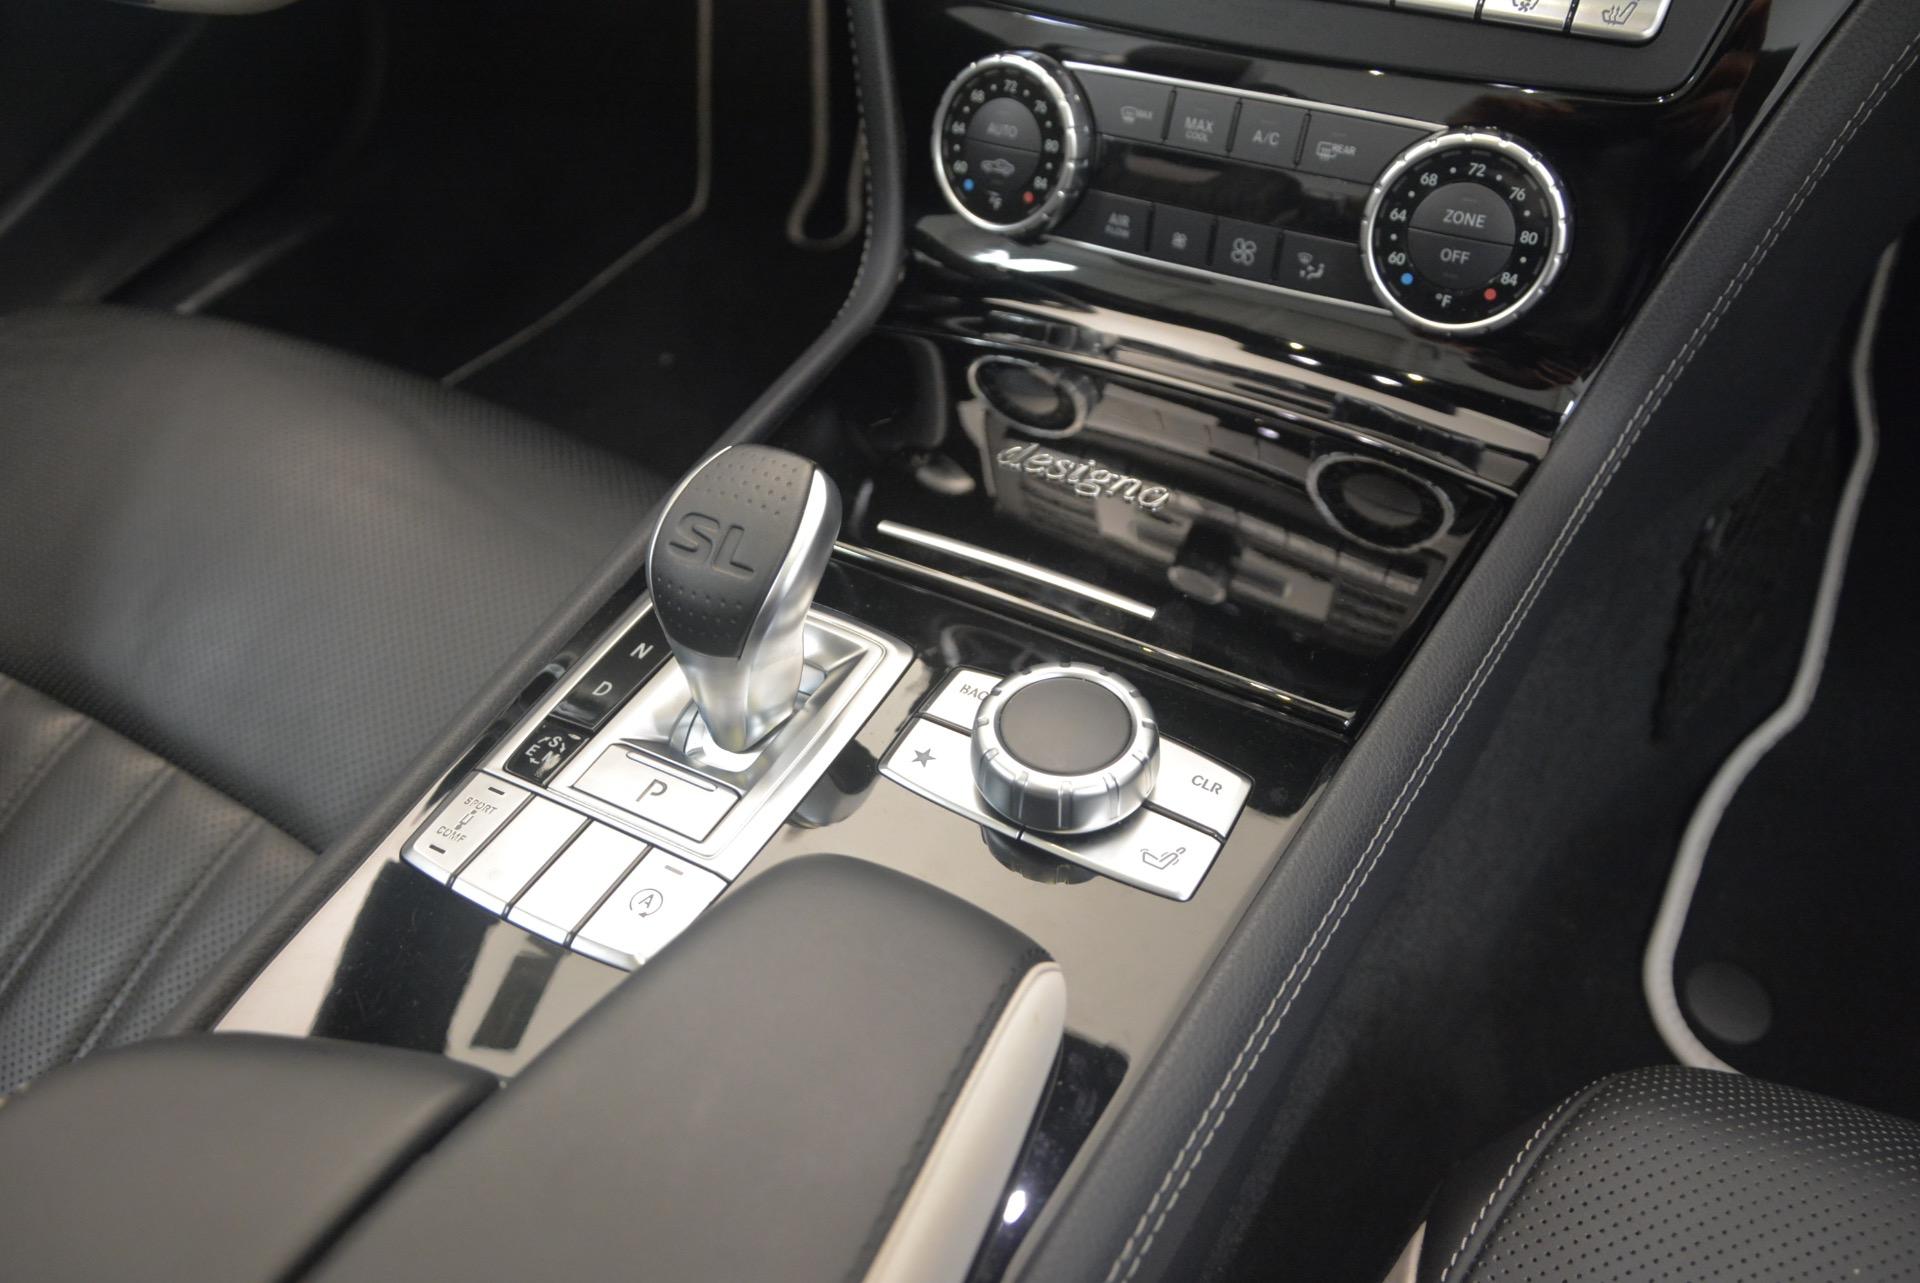 Used 2015 Mercedes Benz SL-Class SL 550 For Sale In Greenwich, CT. Alfa Romeo of Greenwich, M1874A 1261_p46